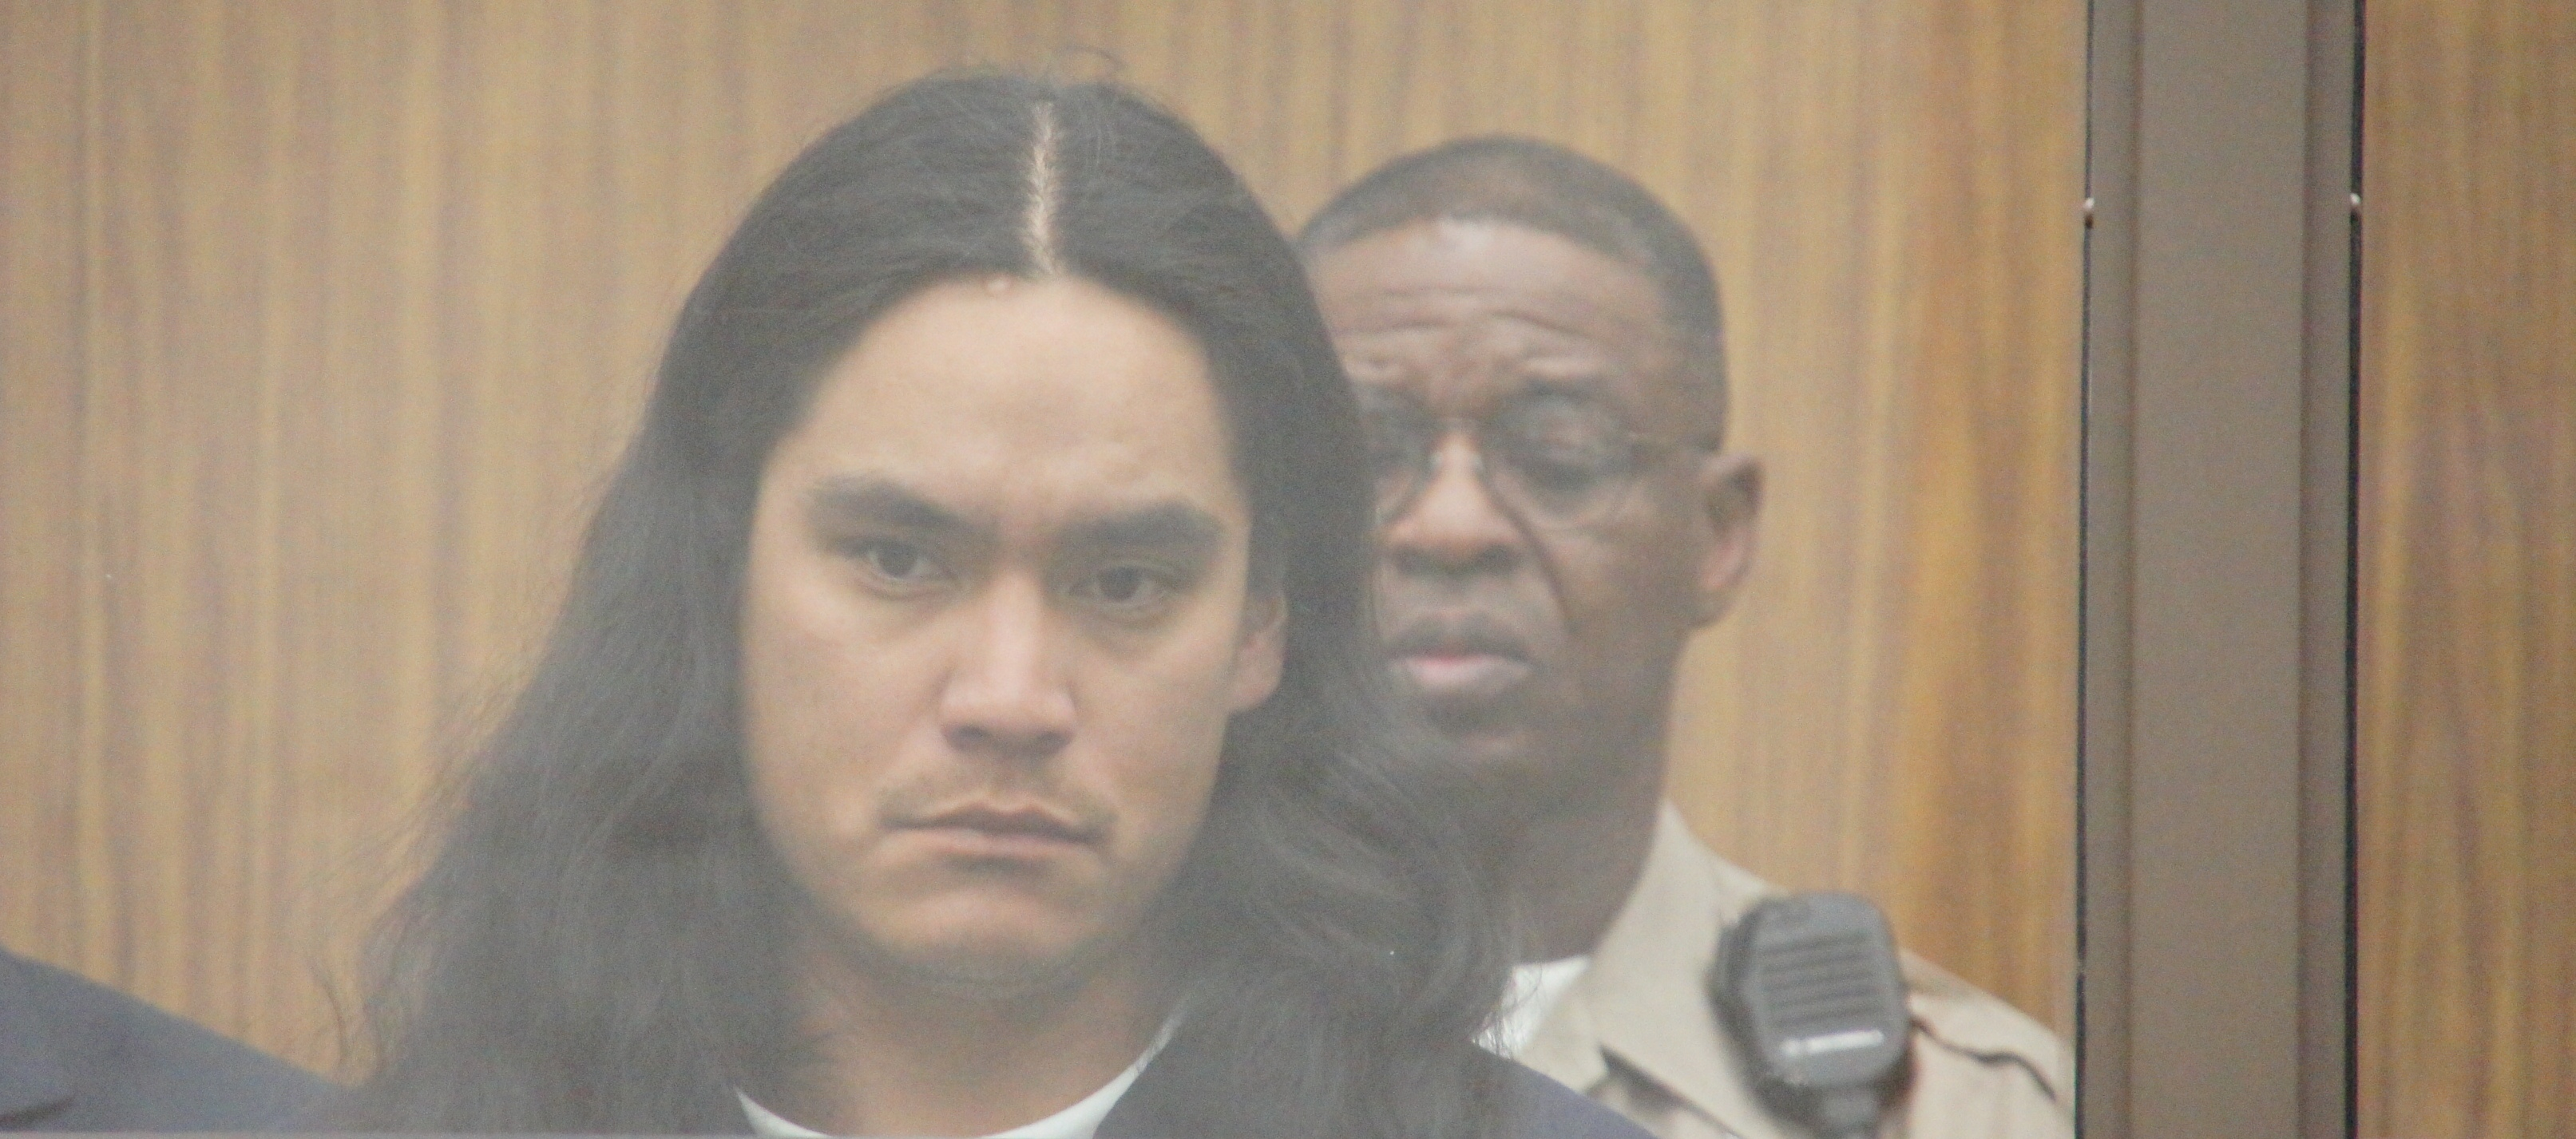 Photo of Stutzman at his arraignment.  PHOTO BOB WEATHERSTON